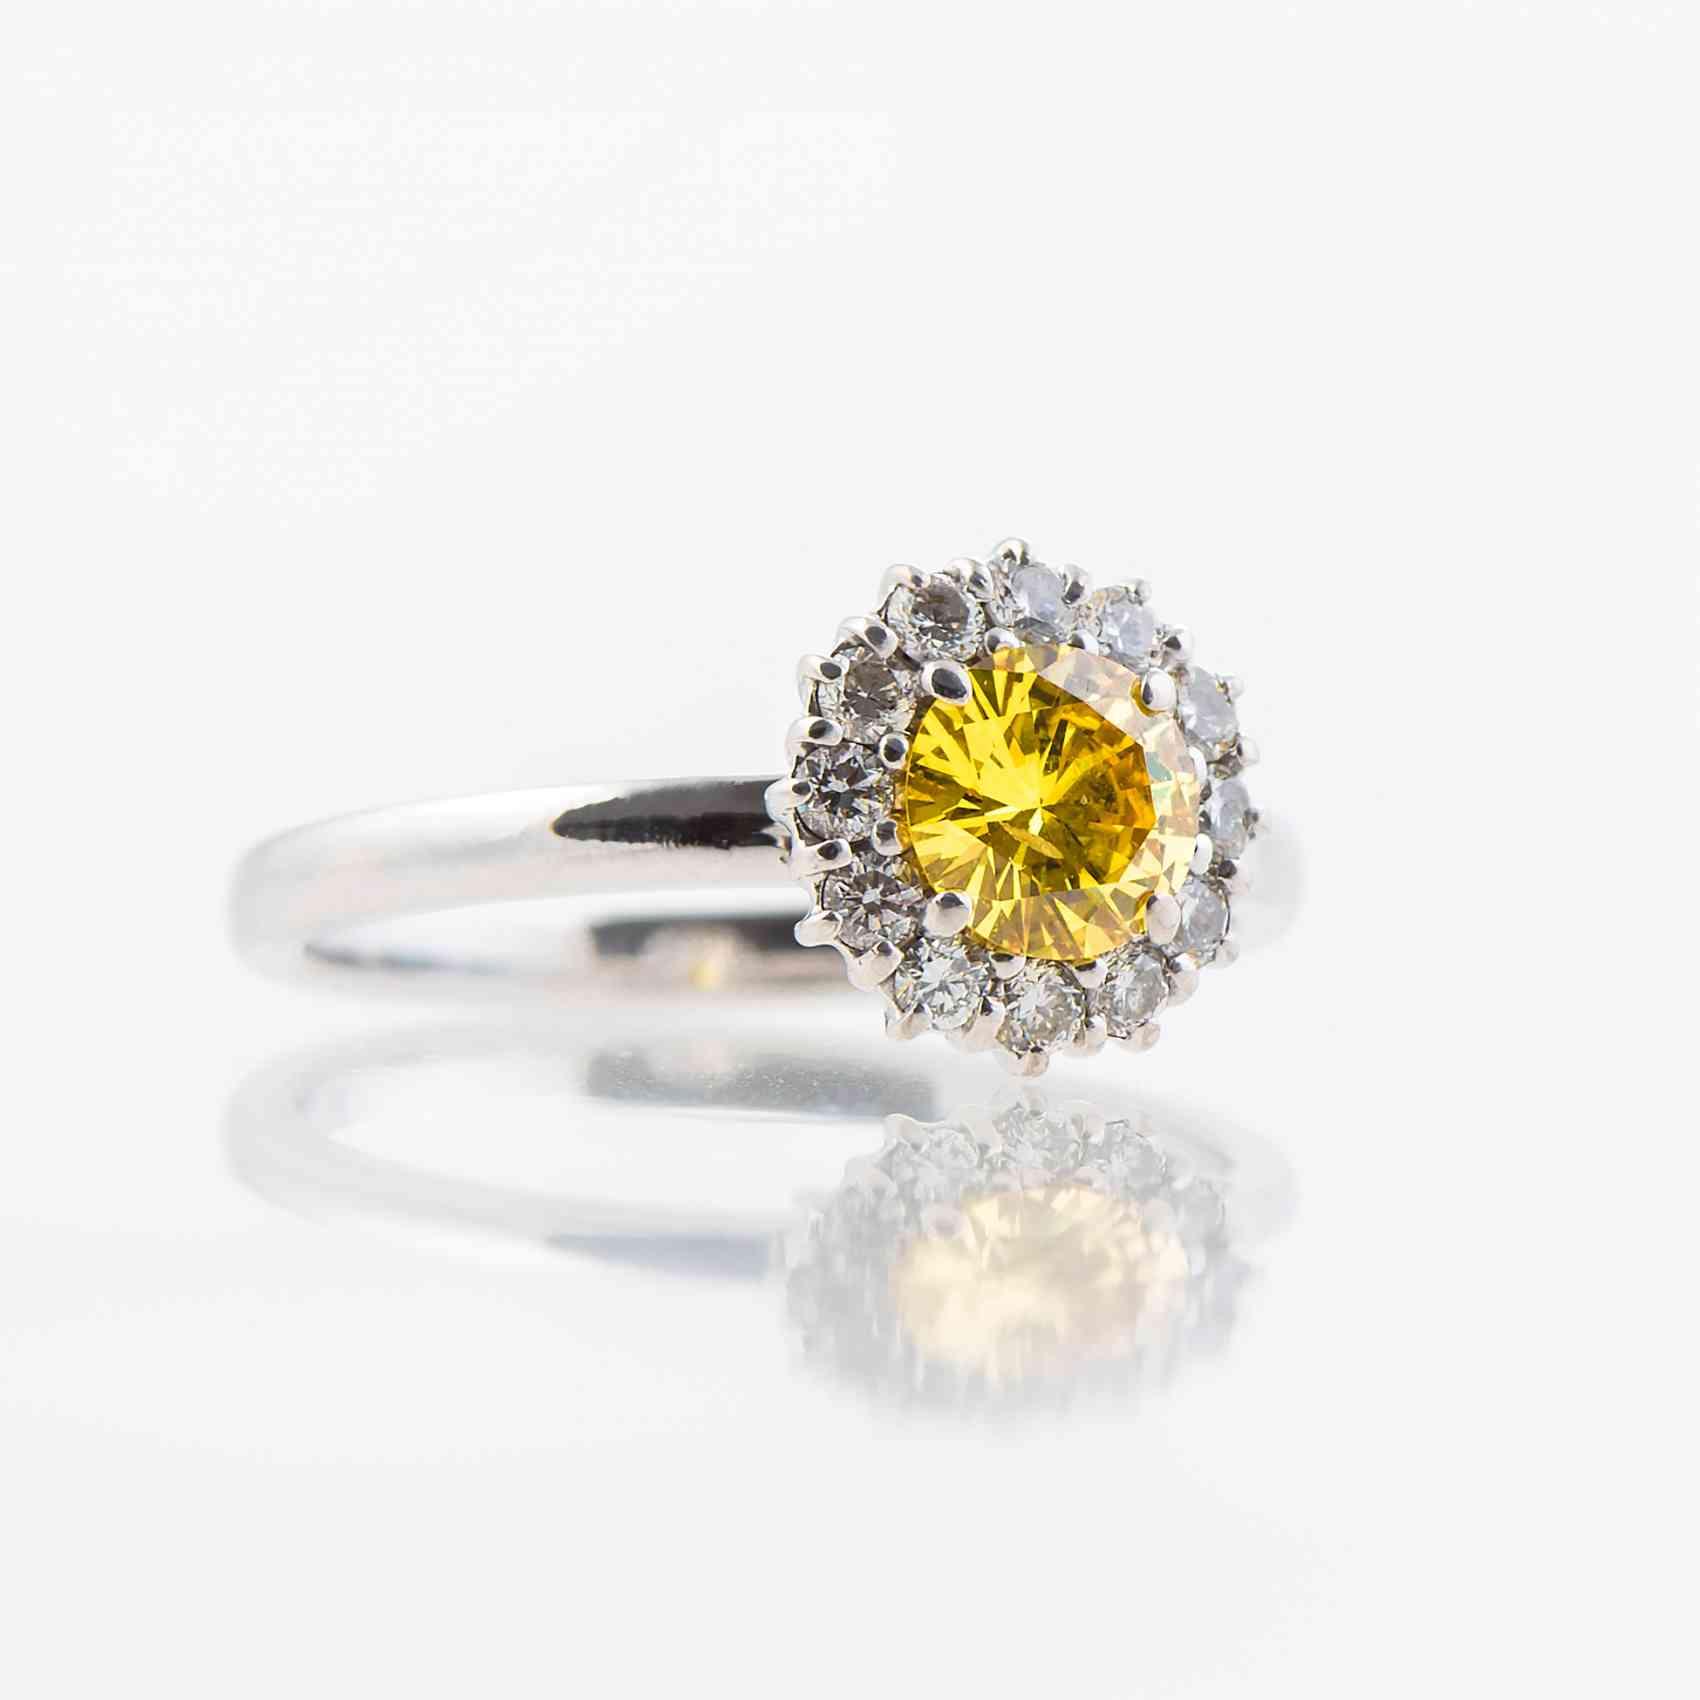 Inel din aur alb 18K cu Diamant Yellow Fancy